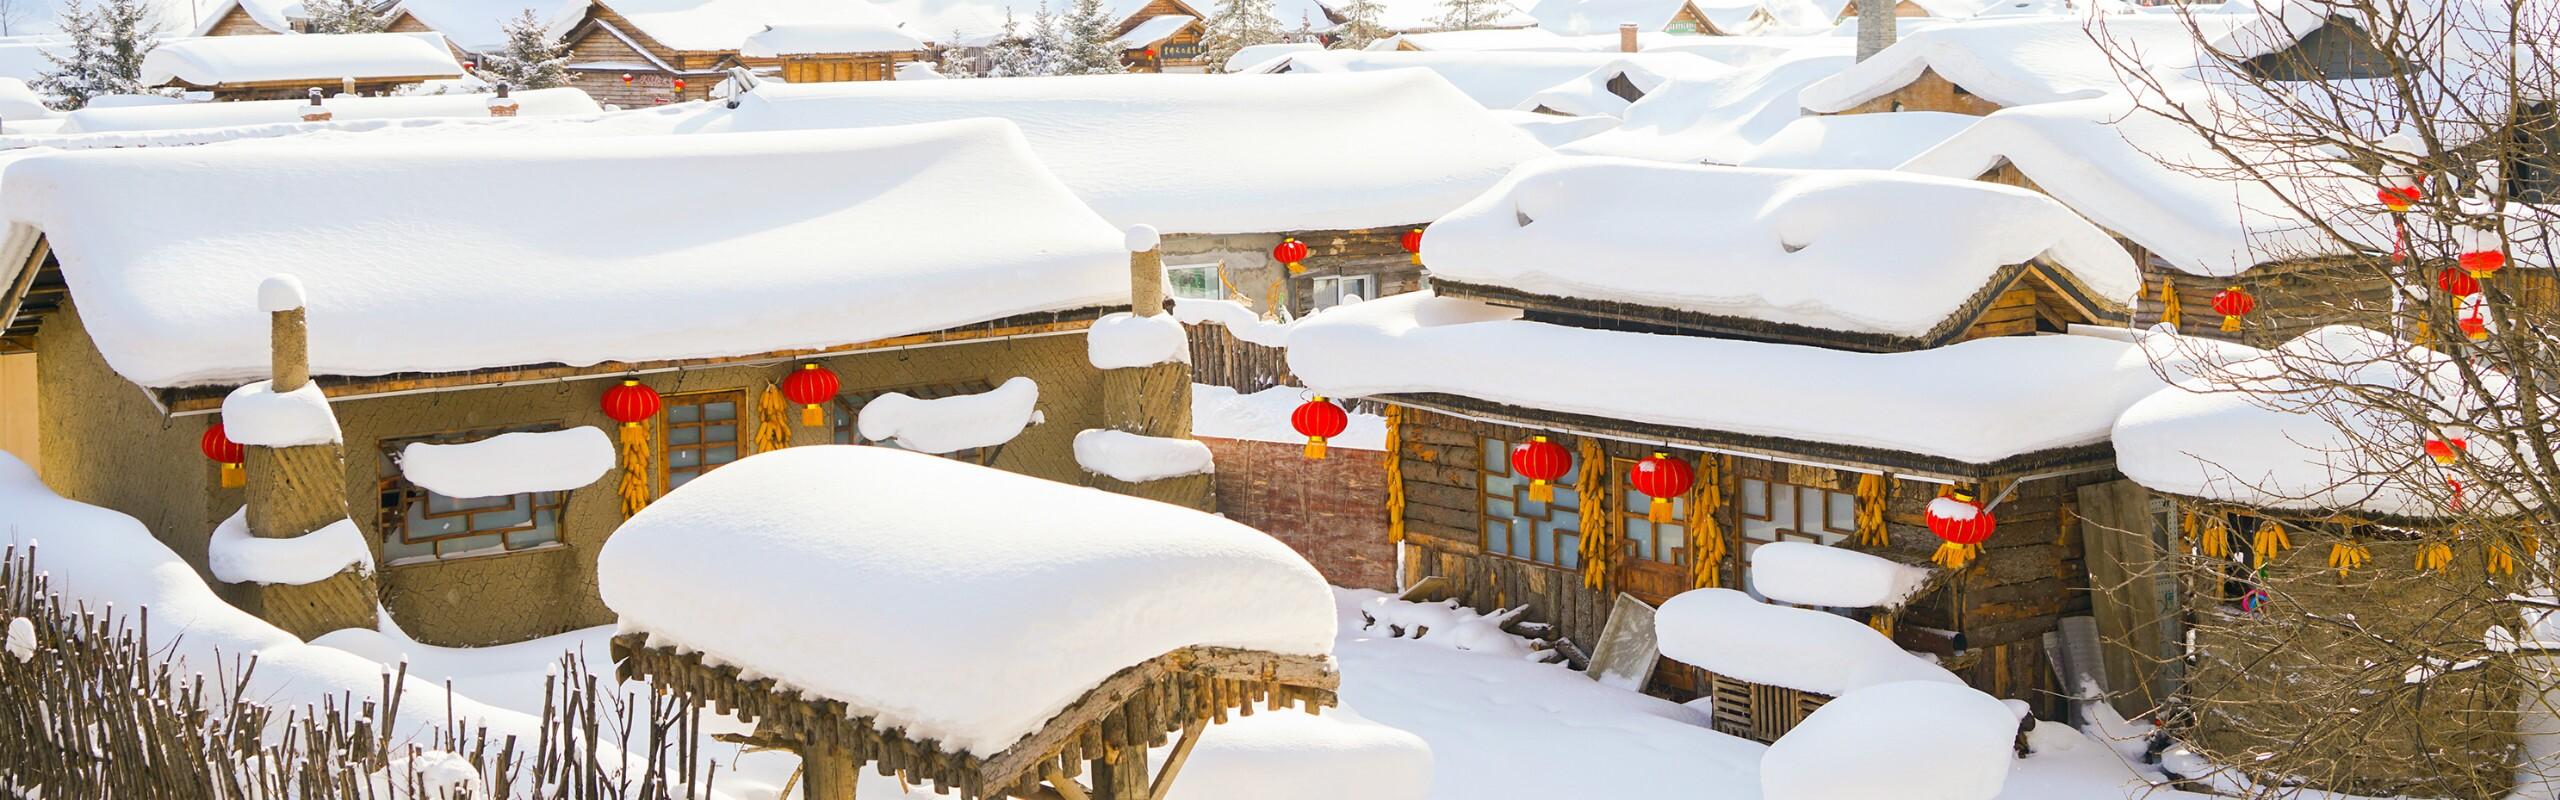 China Winter Holiday Tours 2021/2022